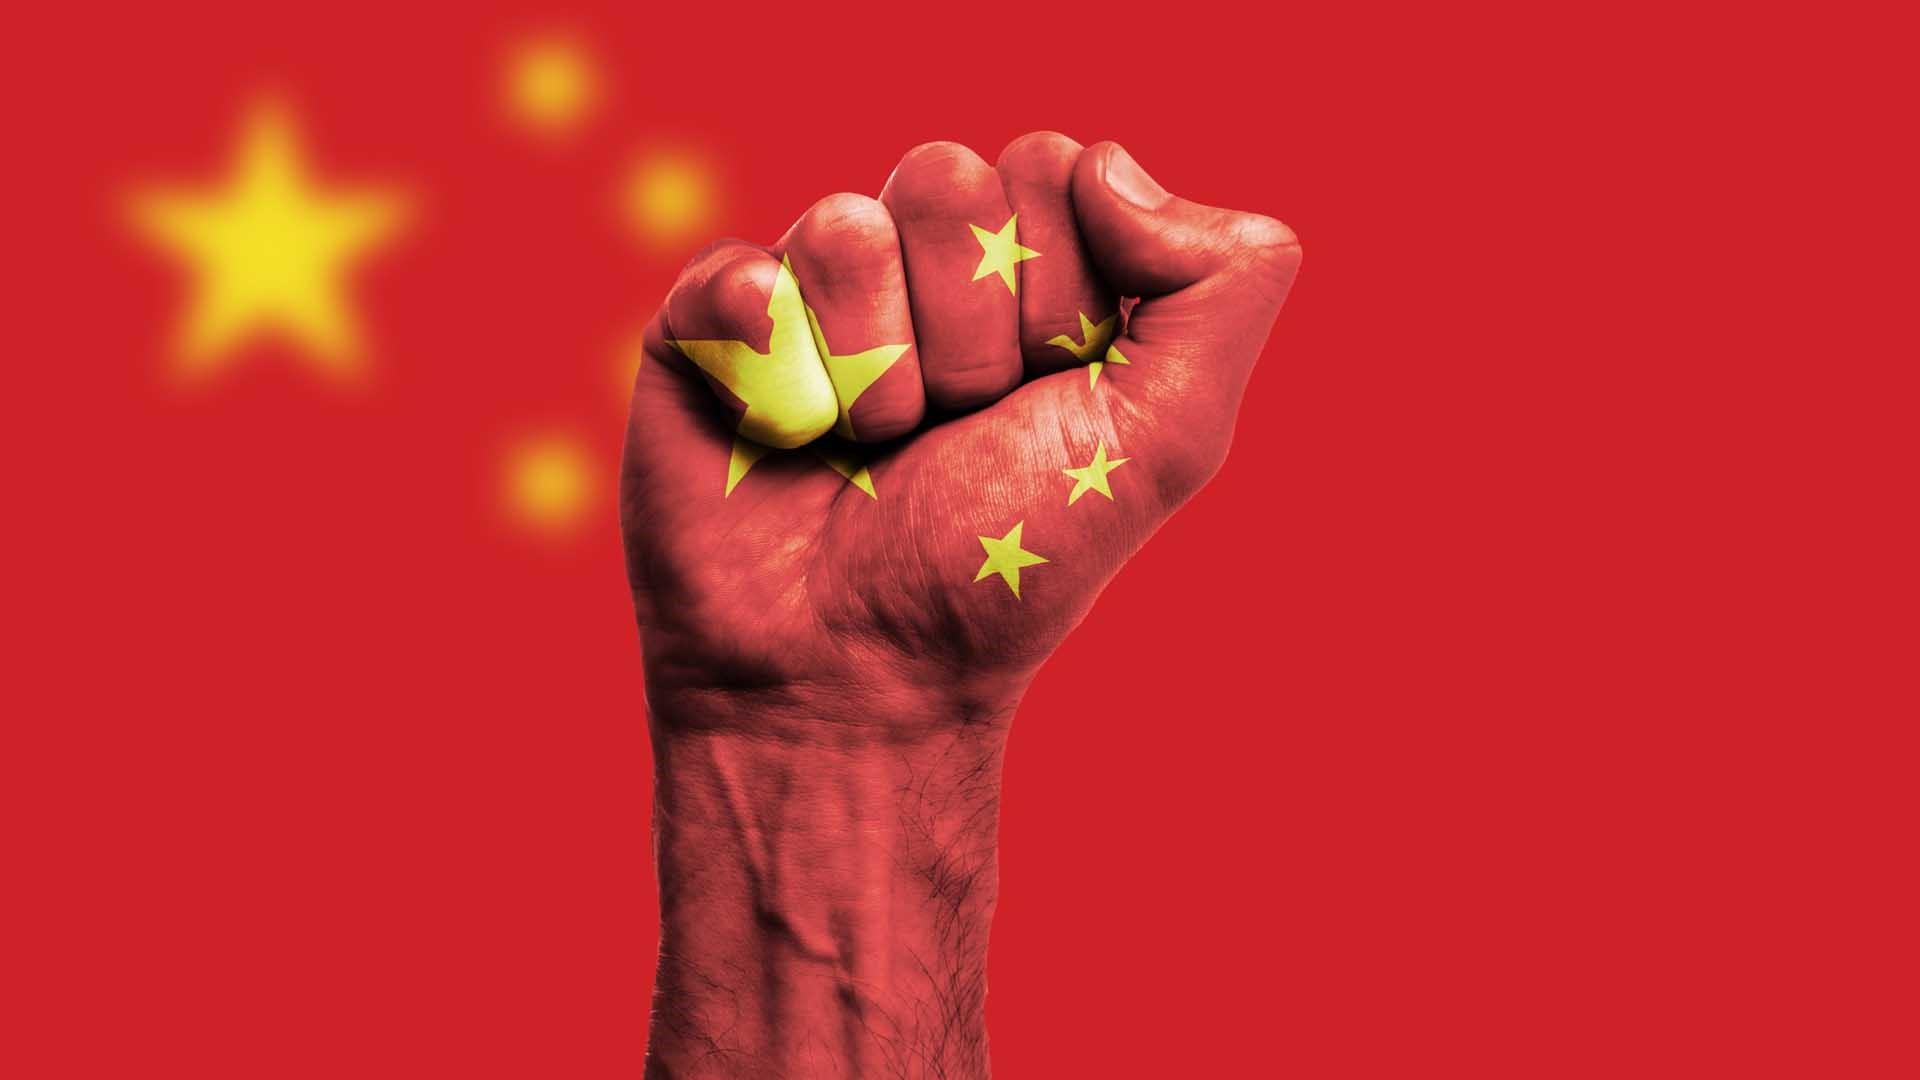 Crude oil demand in danger due to China economic slowdown 1